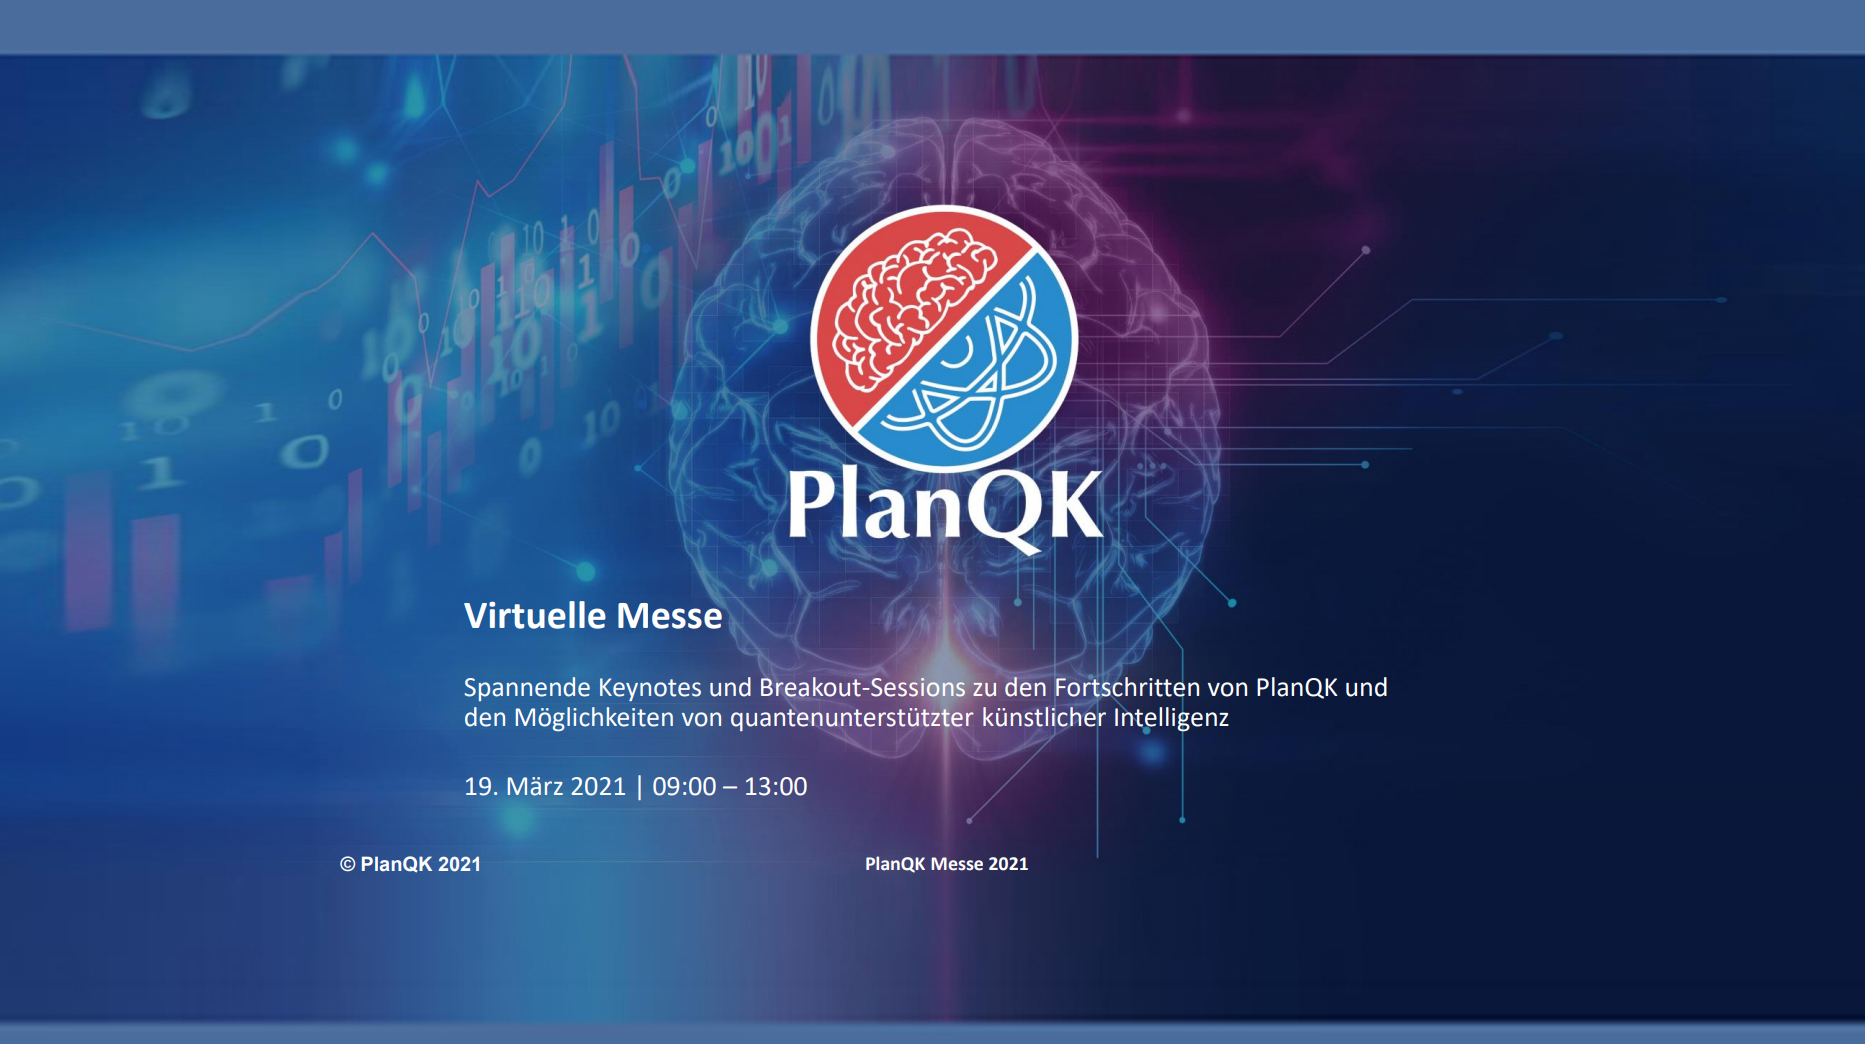 Bild: Virtuelle Messe PlanQK